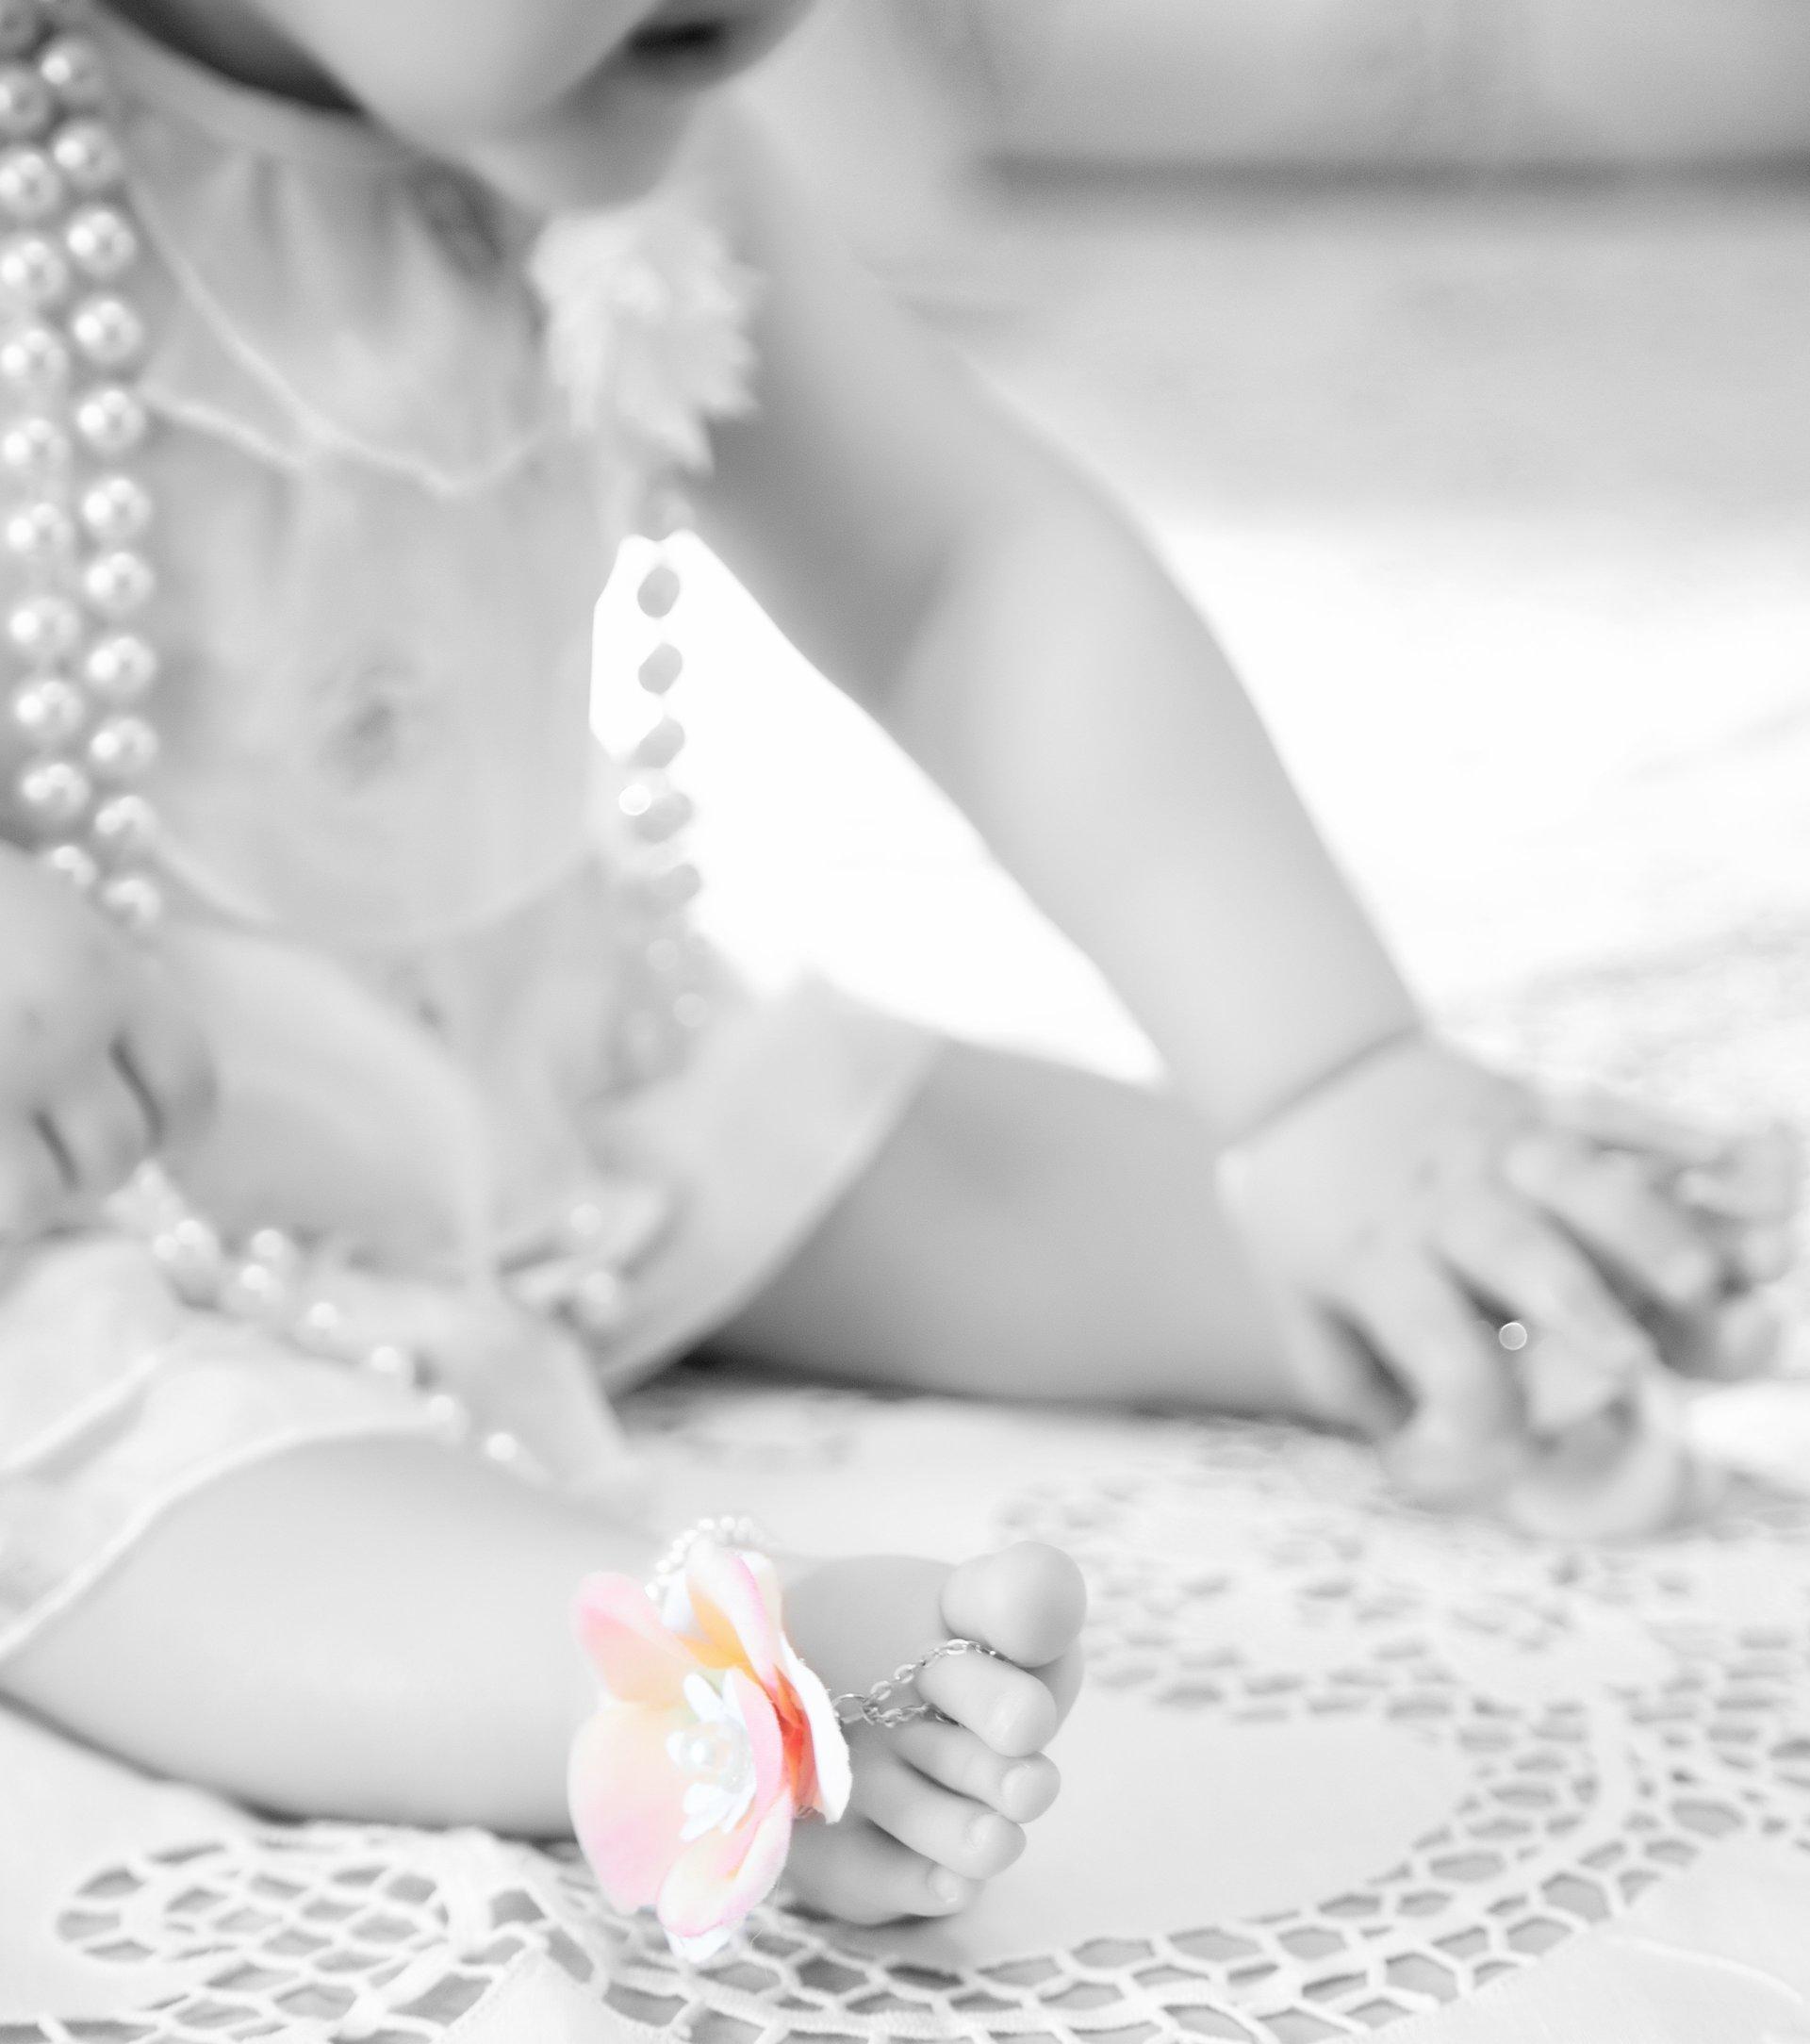 bambino con collana di perle